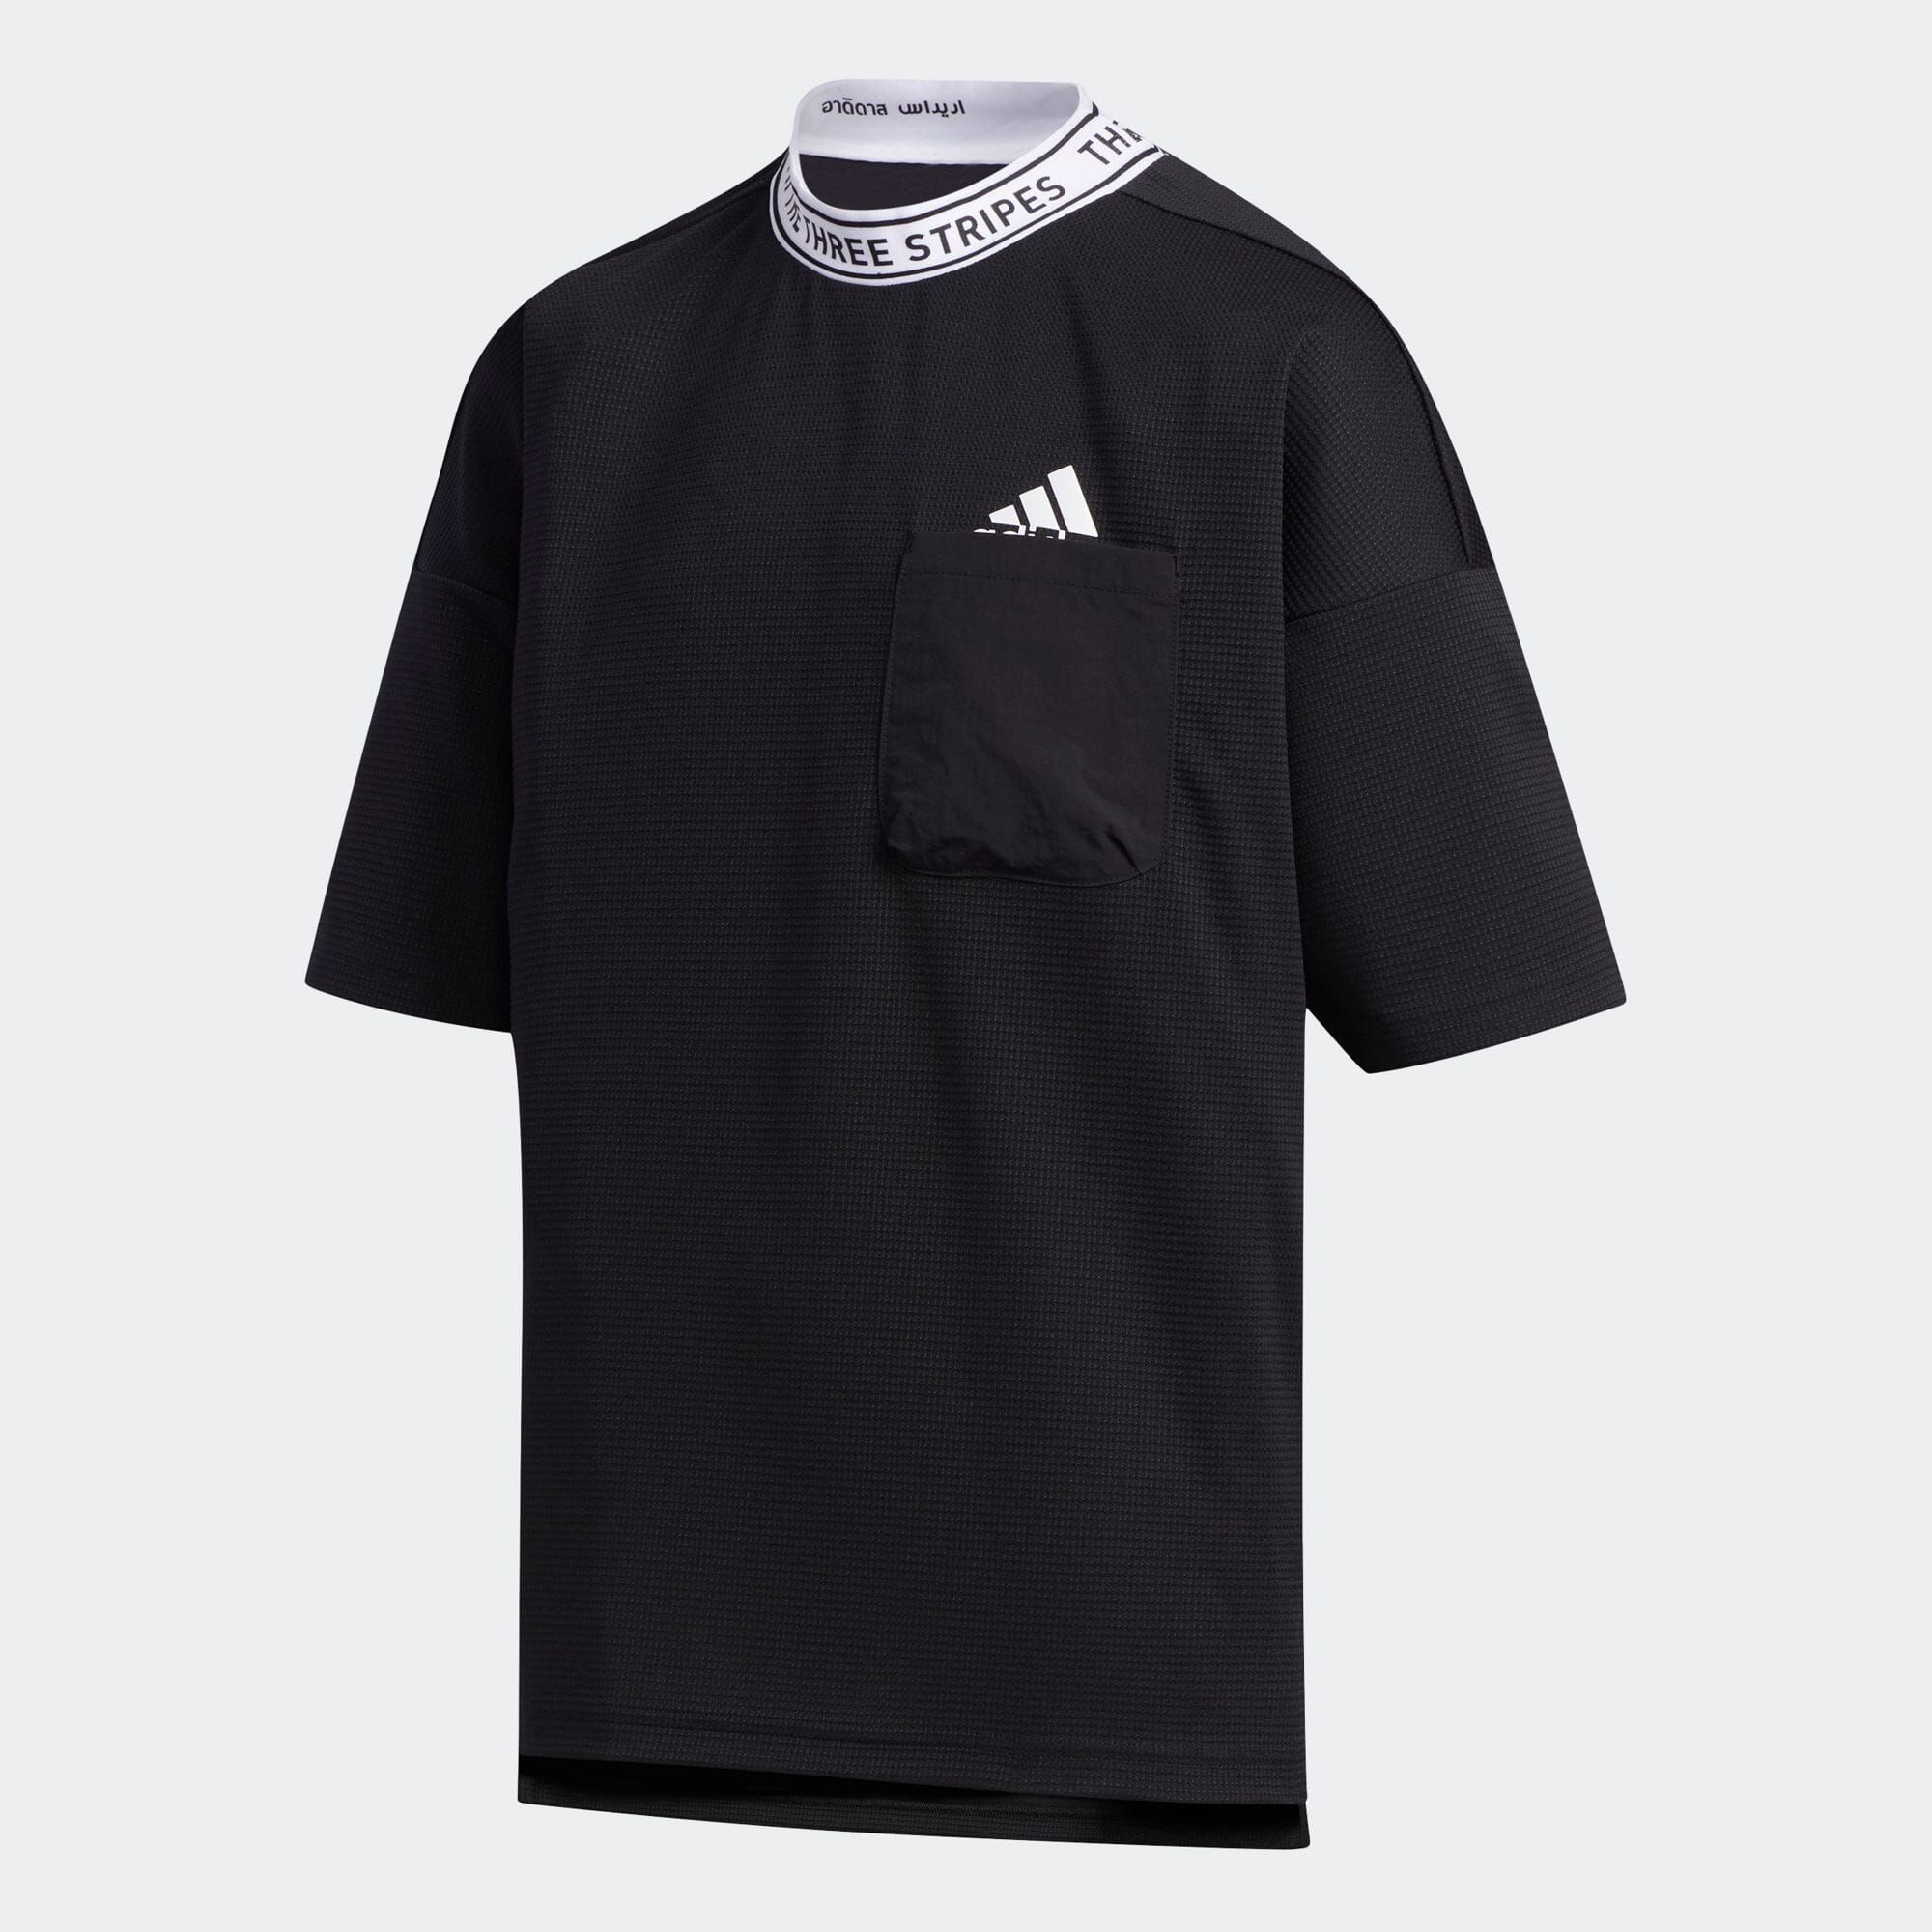 WF 半袖Tシャツ / WF Tee